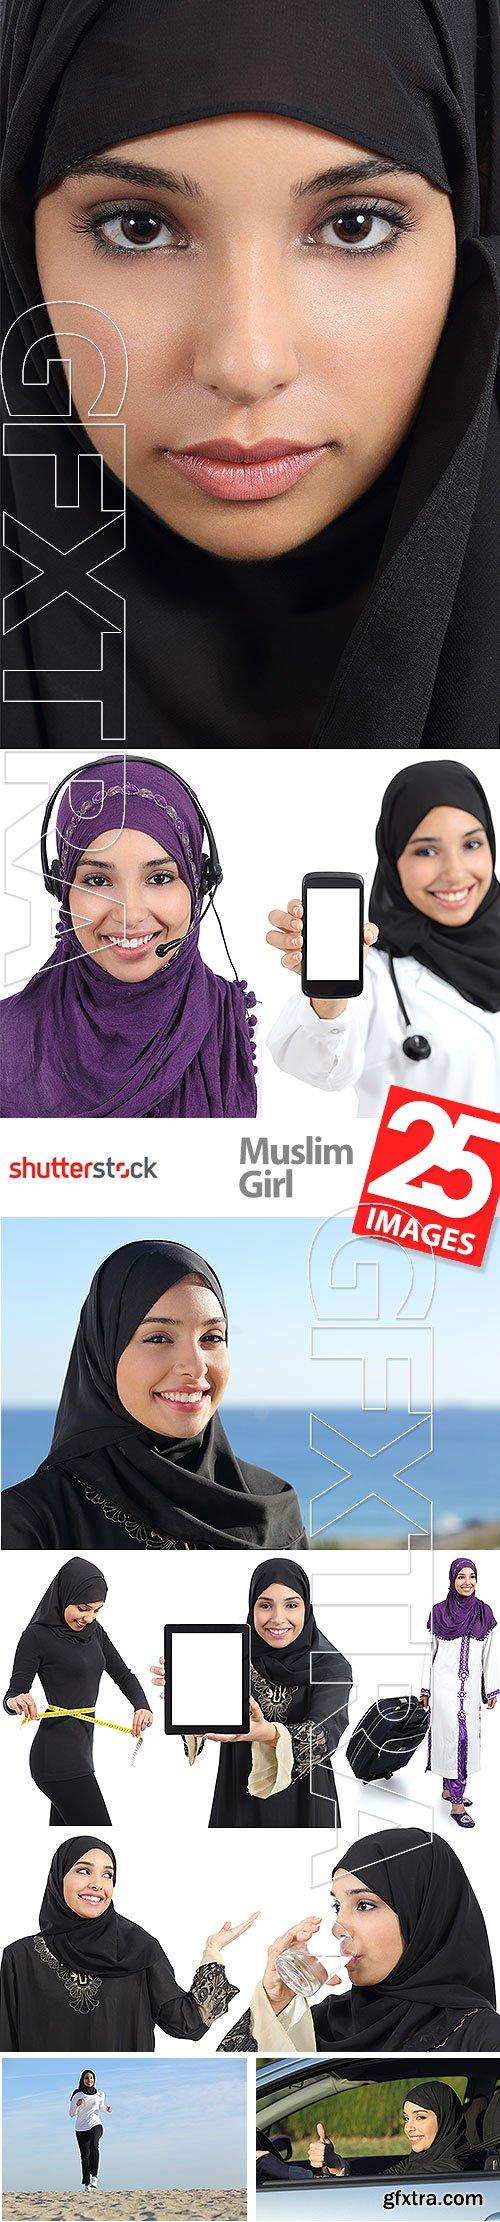 Muslim Girl 25xJPG